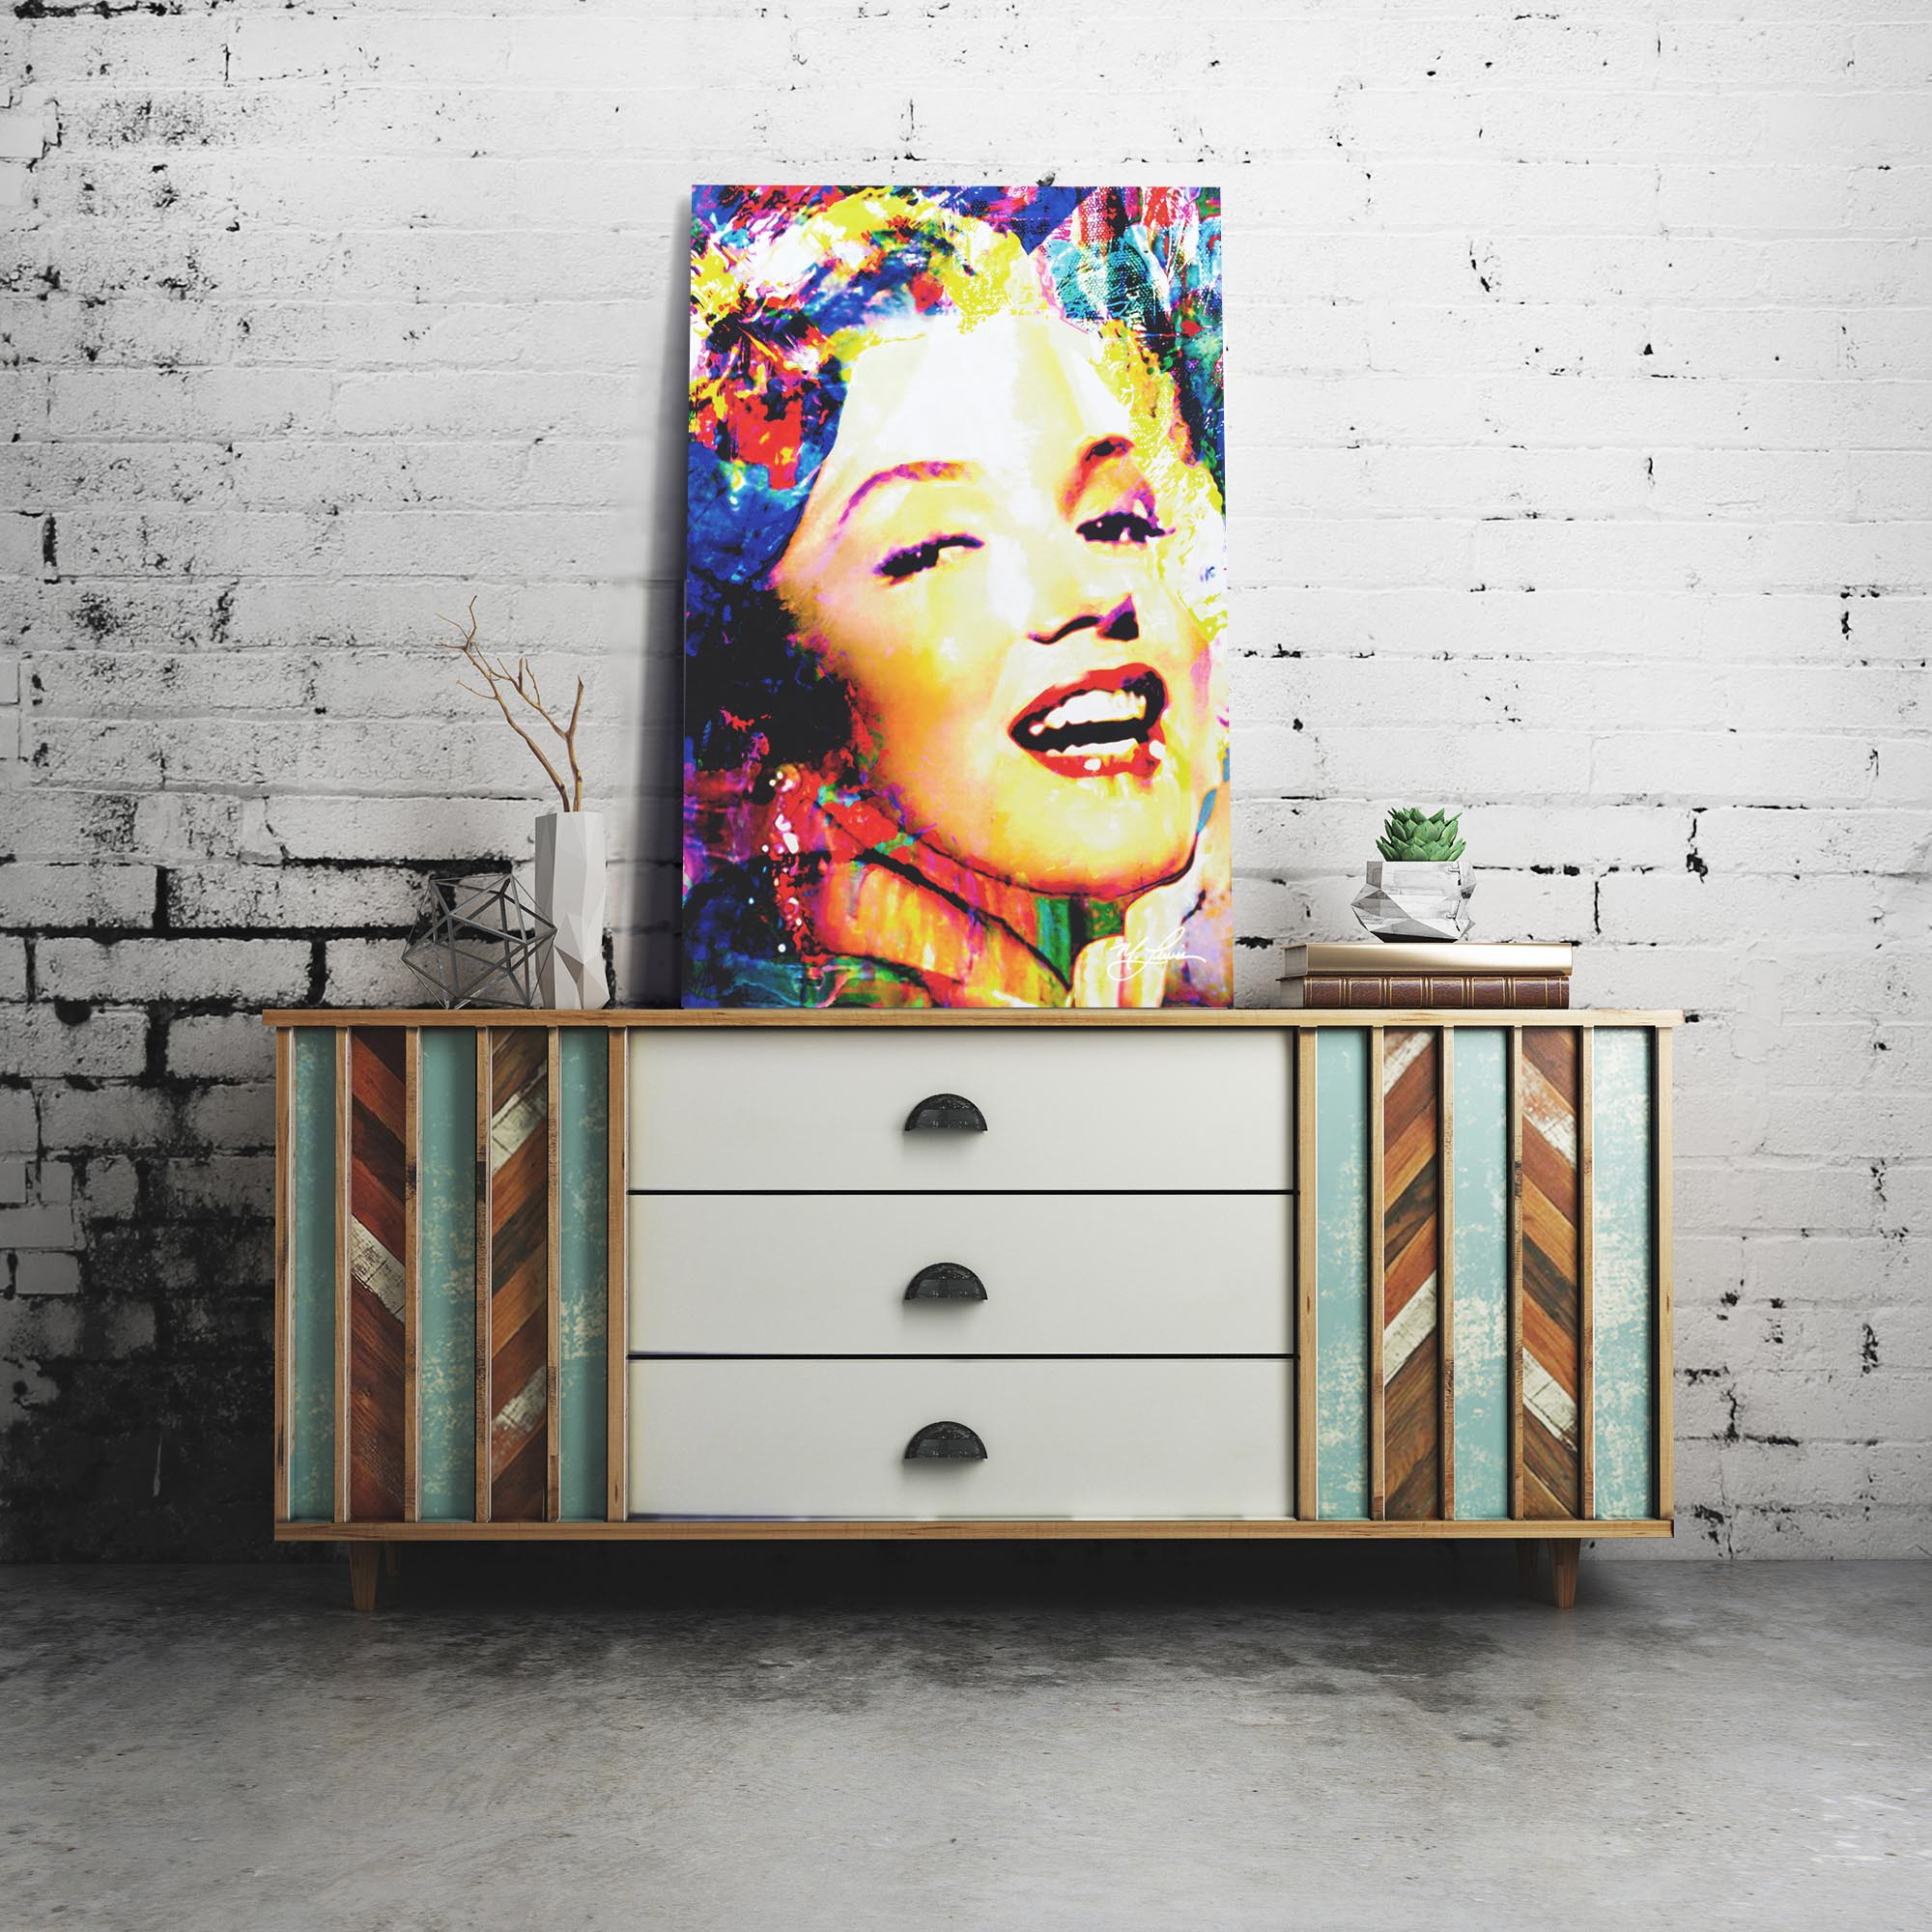 Marilyn Monroe Marilyn Bee by Mark Lewis - Celebrity Pop Art on Metal or Plexiglass - ML0041